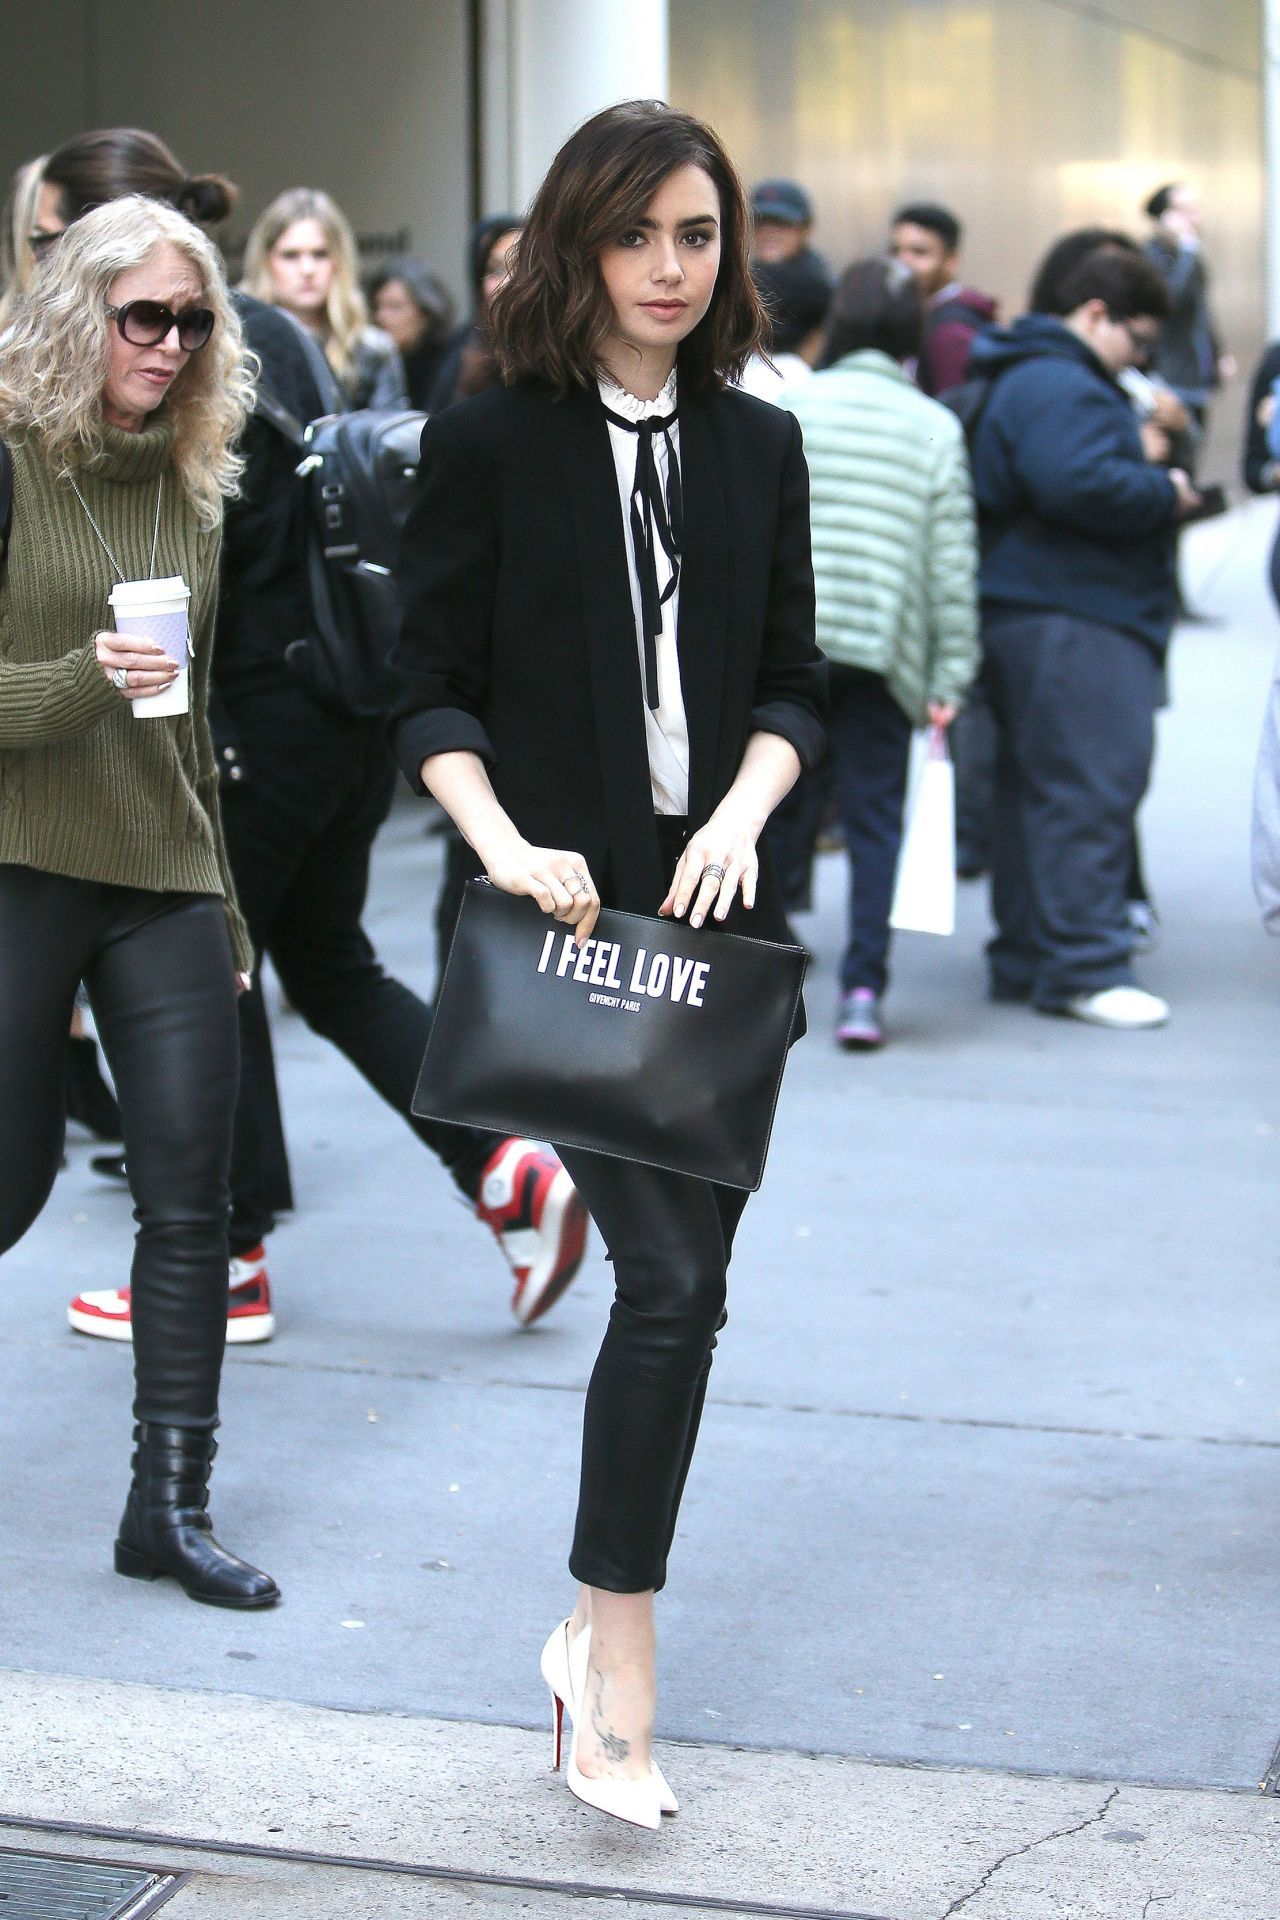 d1f014b0c908 Estilo Preppy, Lily Collins Fashion, Lily Collins Casual, Lily Collins  Style, Lily